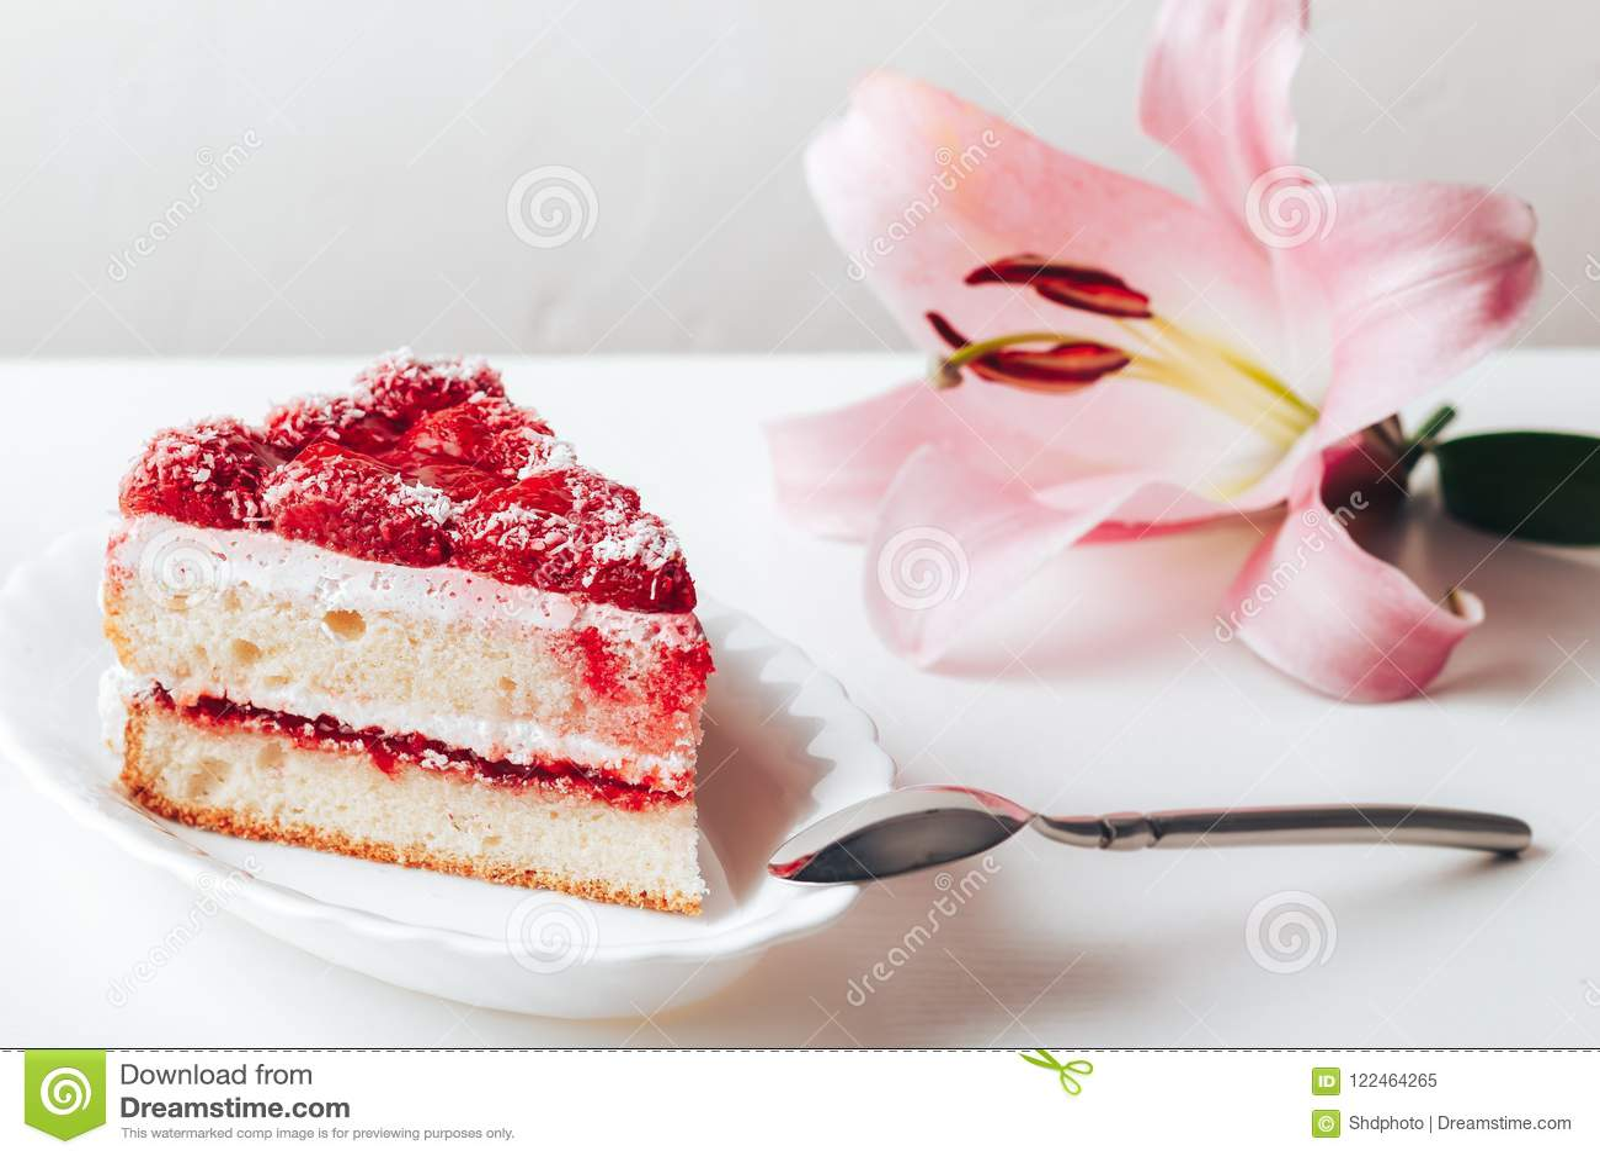 Strawberry Cake On A White Background Stock Image Image Of